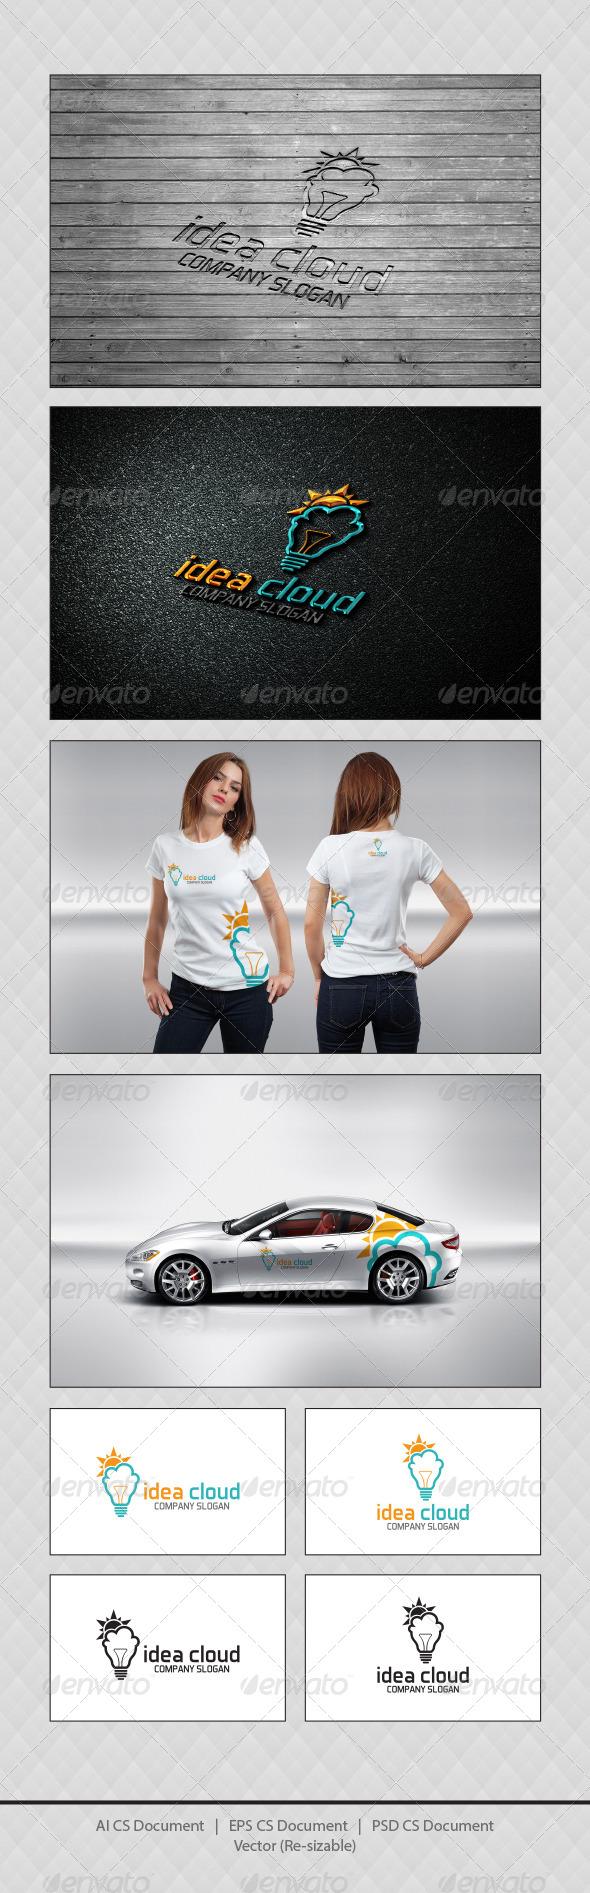 GraphicRiver Idea Cloud Logo Templates 4352546